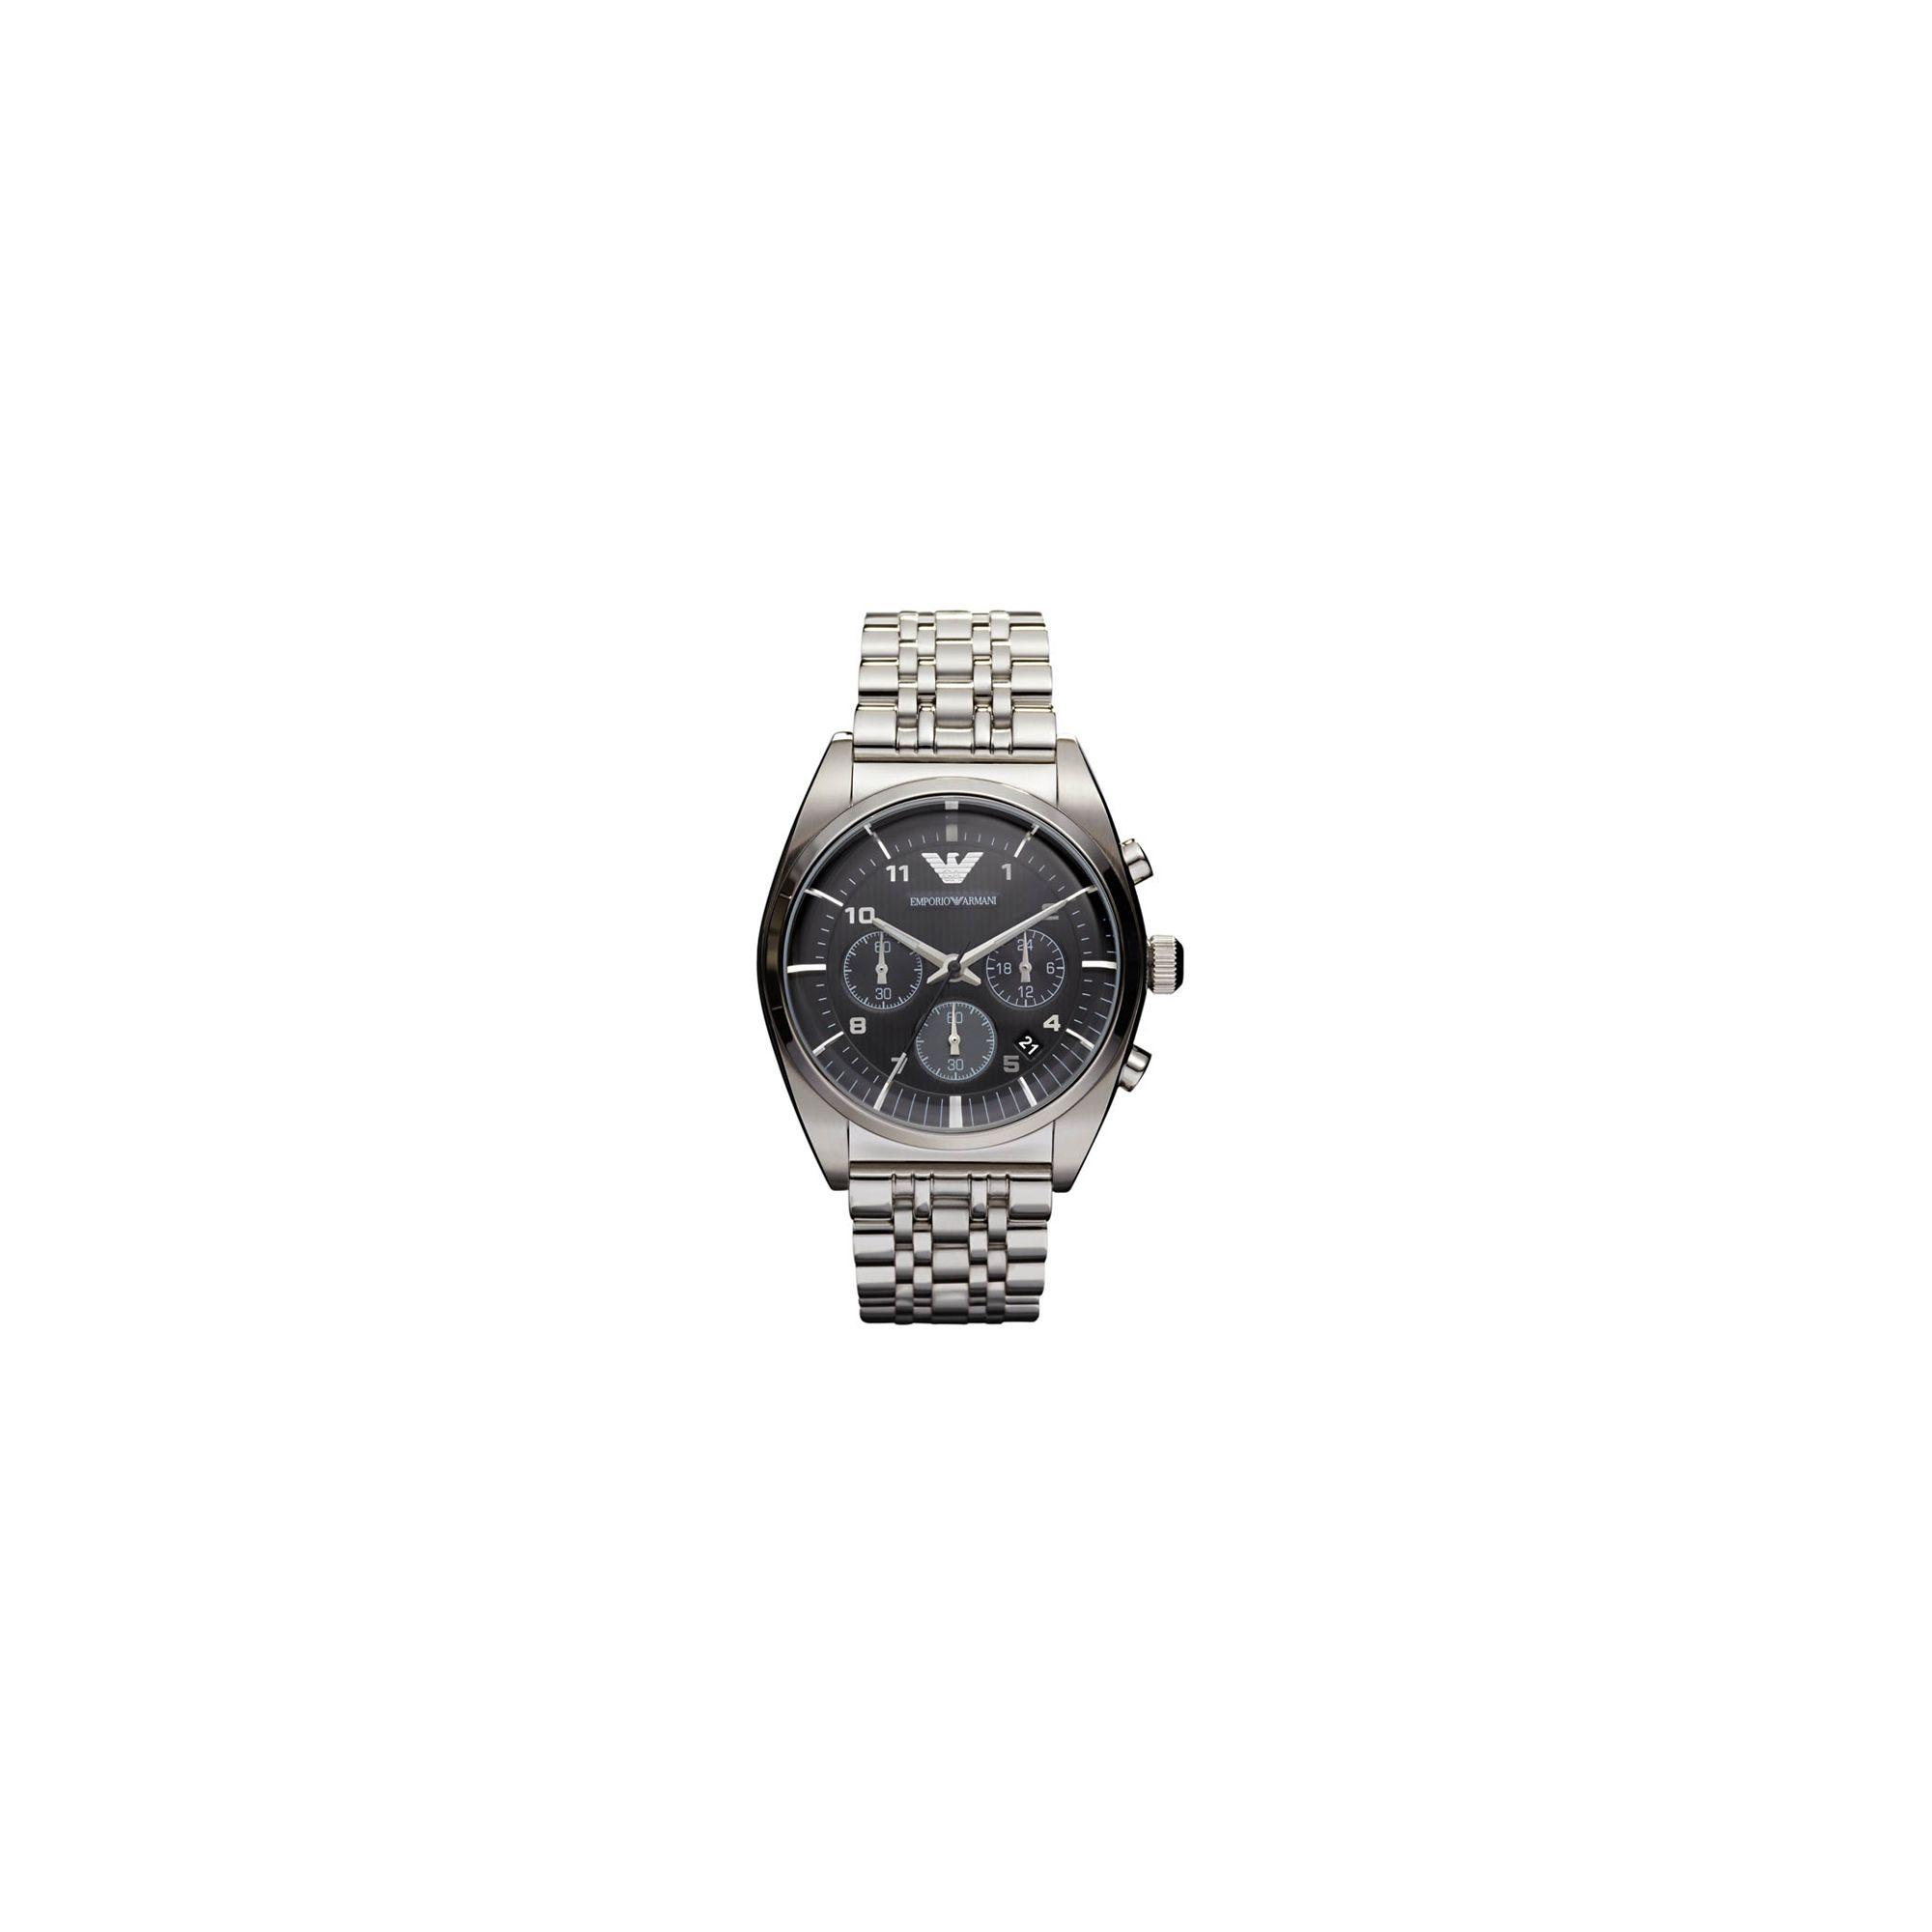 Emporio Armani Gents Chronograph Steel Bracelet Watch AR0373 at Tesco Direct